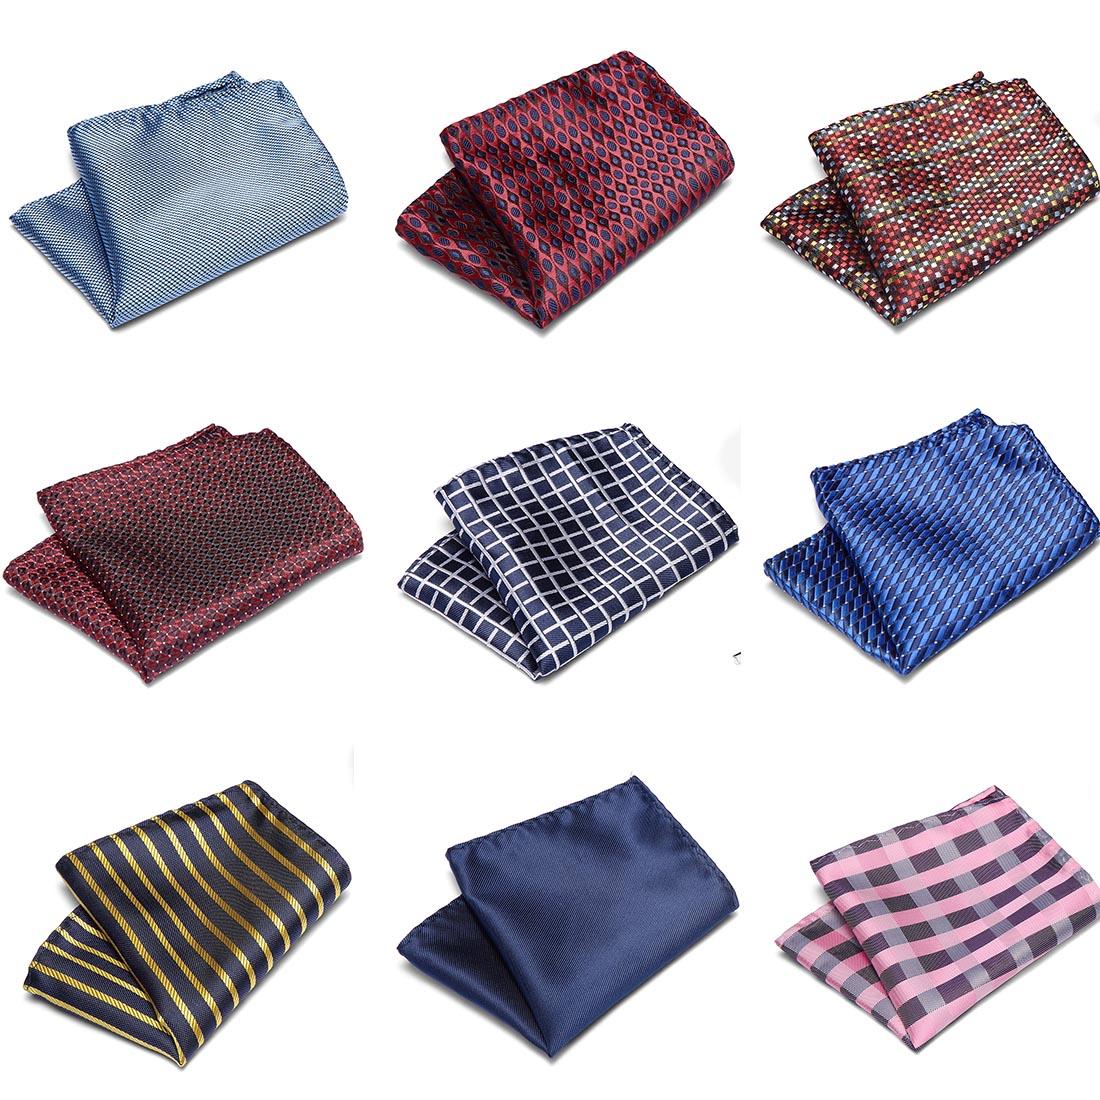 2020 Pocket Square Set Formal Necktie Hankerchief  Gentleman Polyester Silk Neck Tie